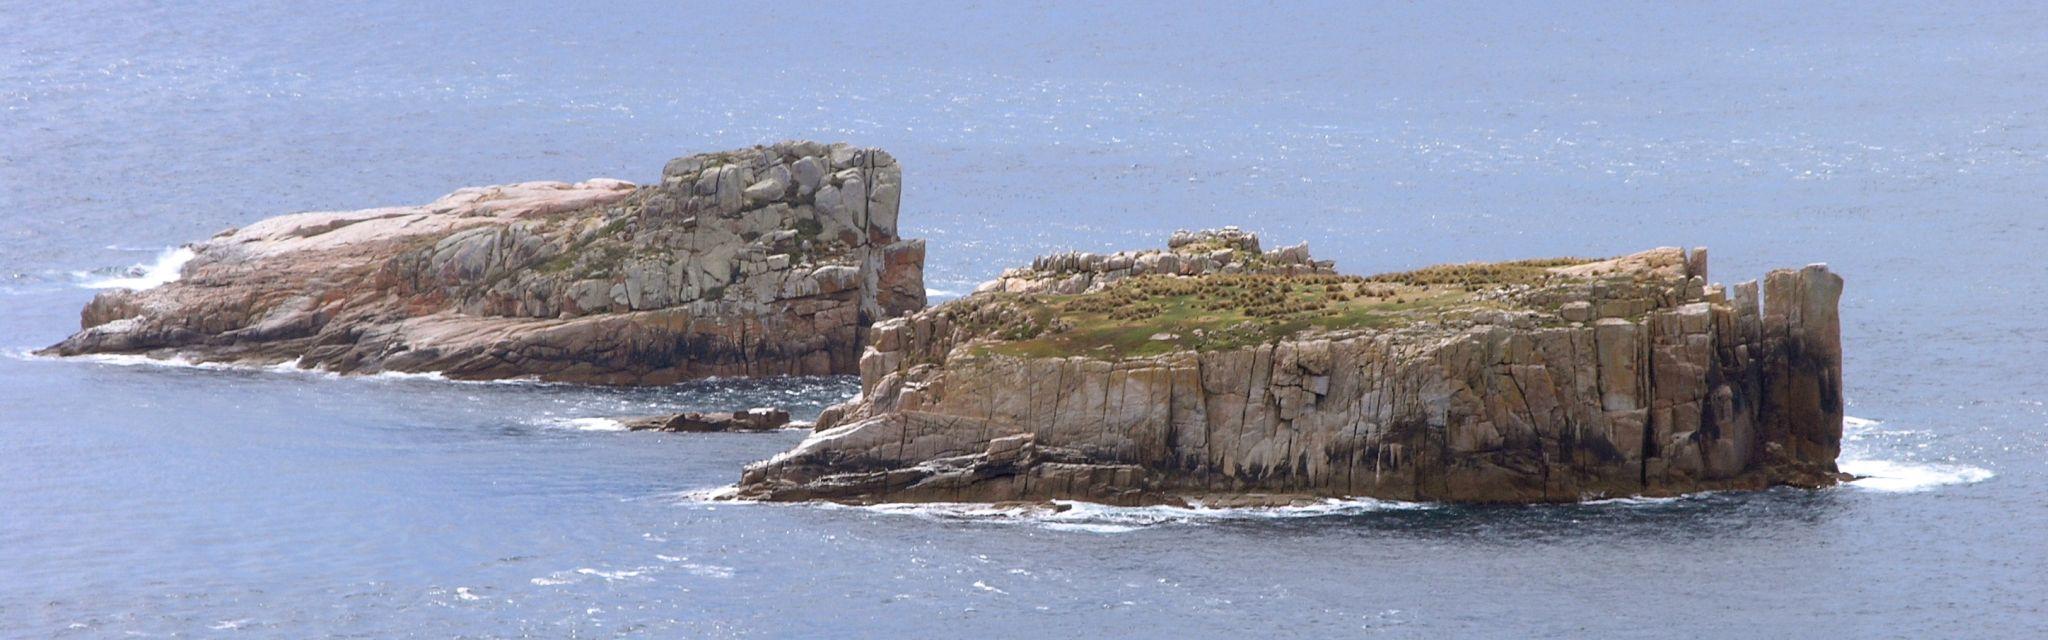 Granite islands off Freycinet Coast, image from a Nature Bound Australia Tasmania National Parks tour